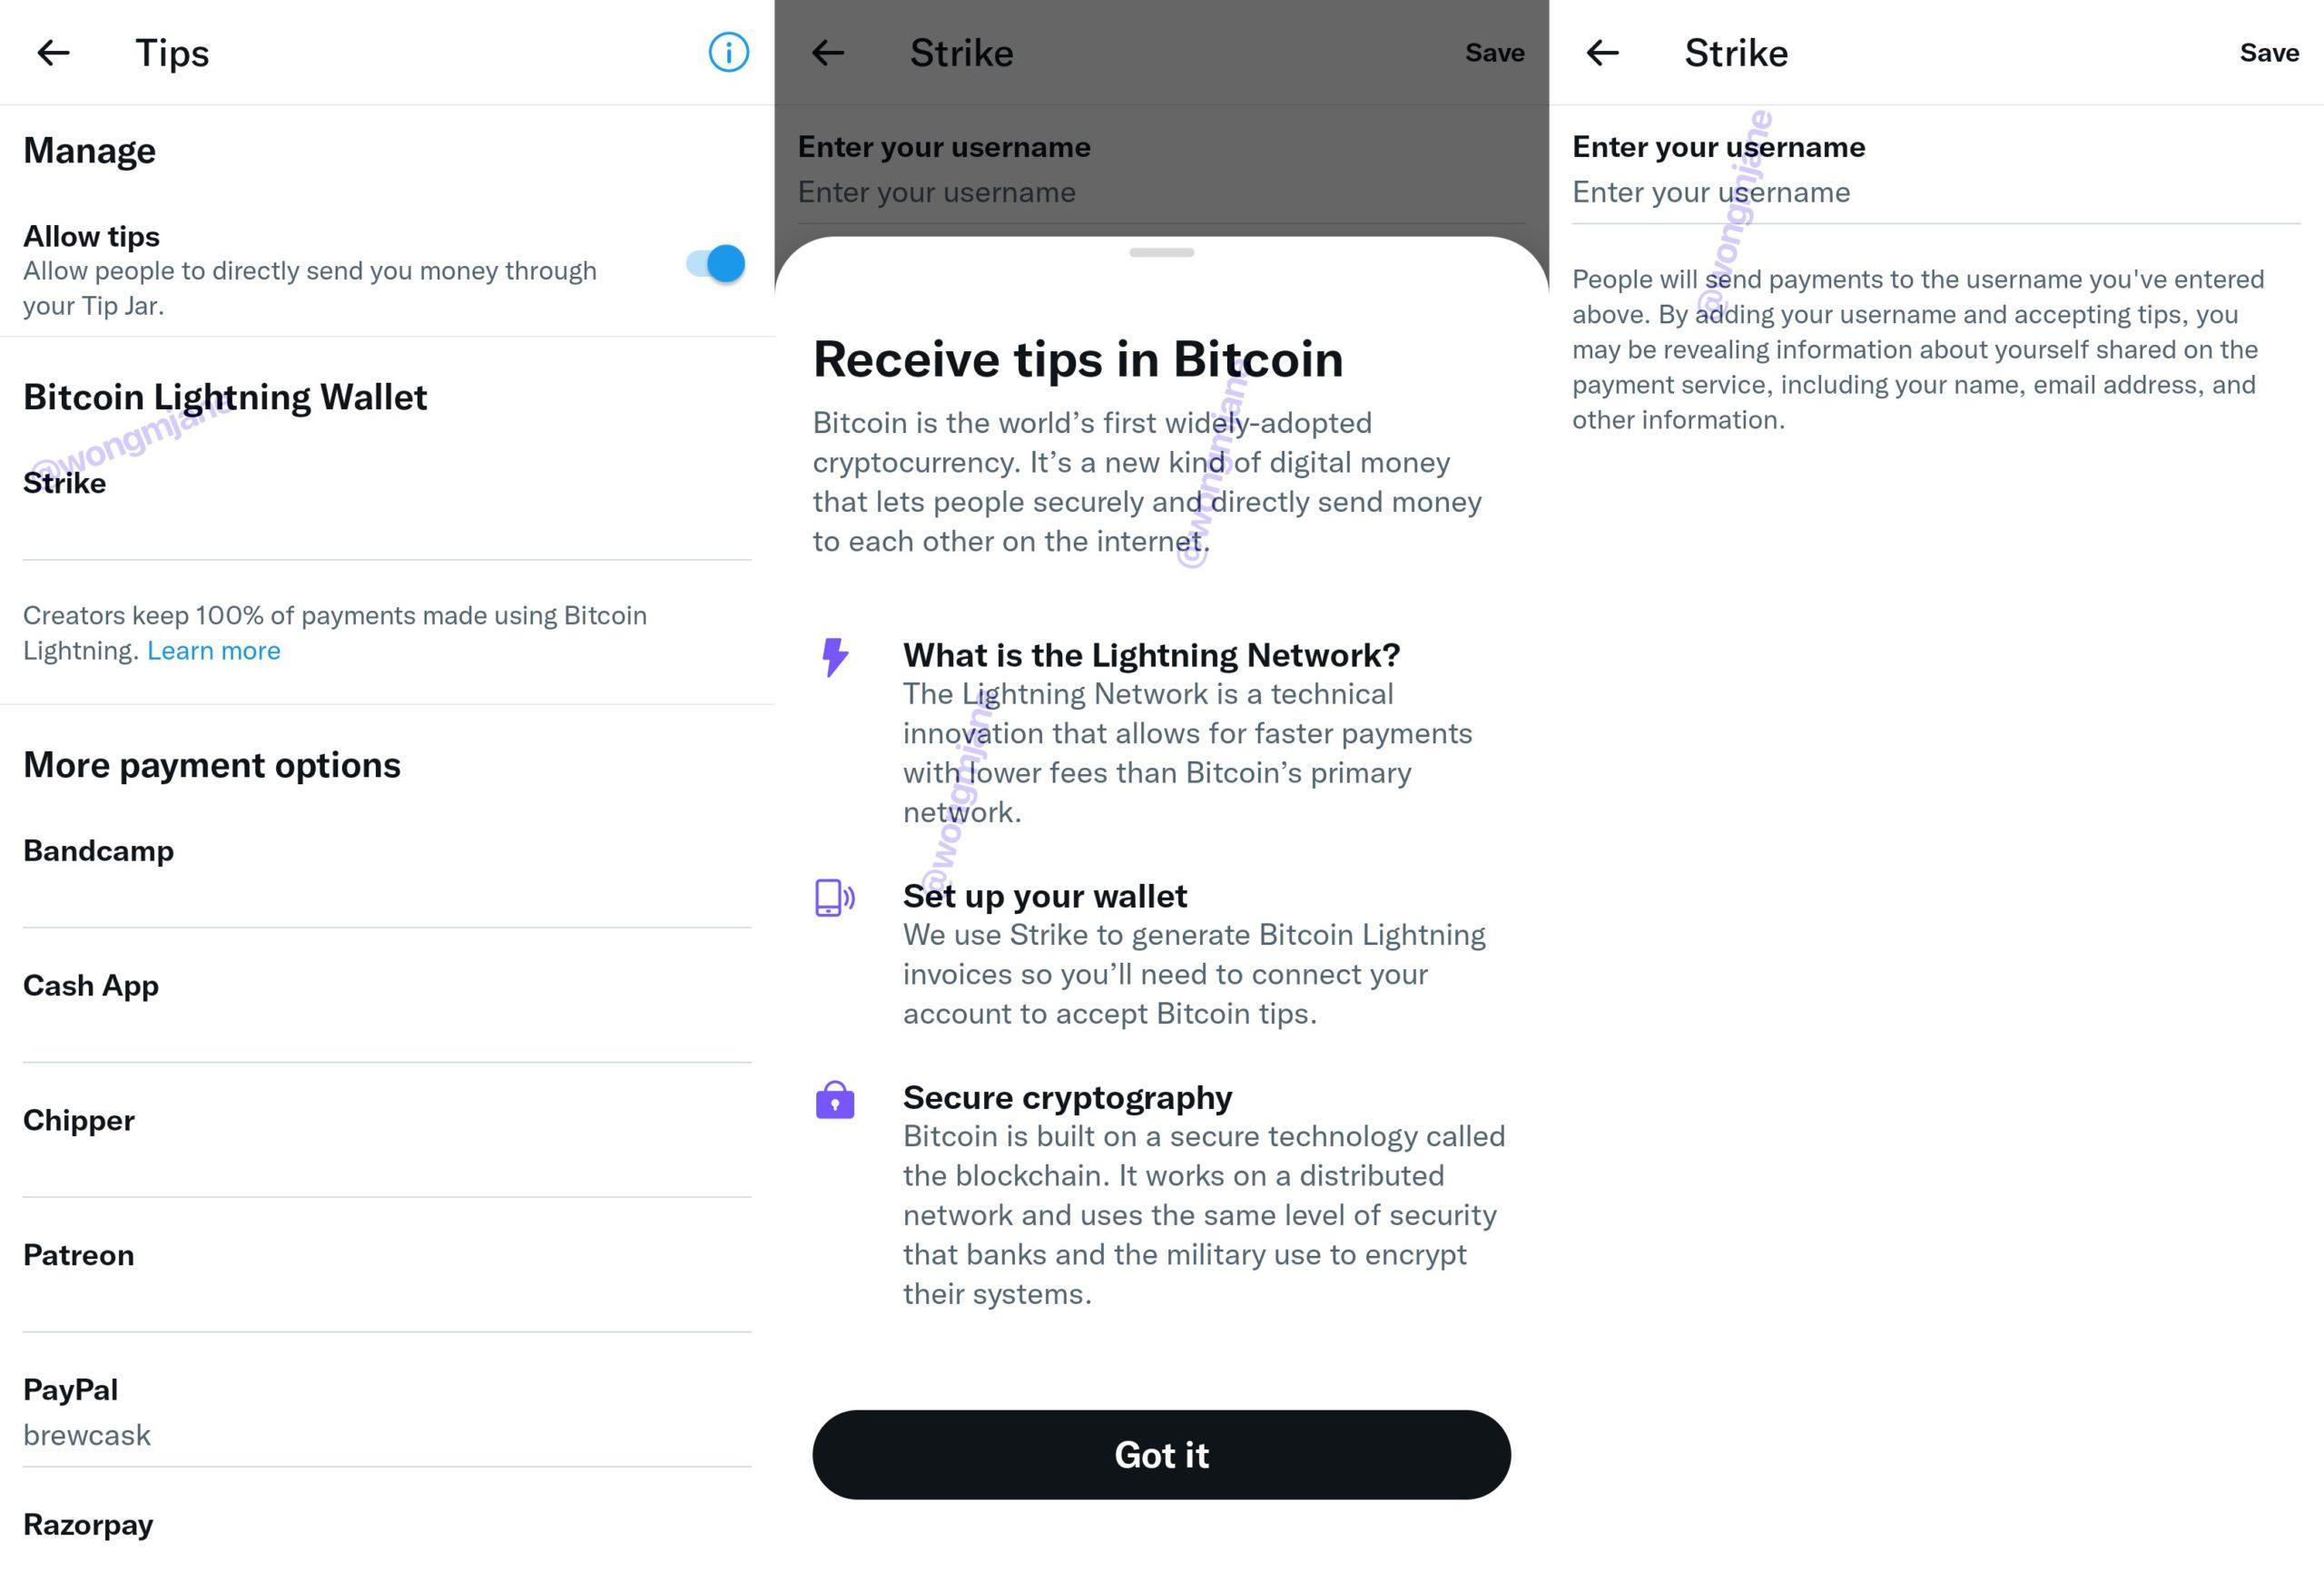 Twitter支持閃電網路|正在 Android 系統上測試「比特幣小費抖內」功能